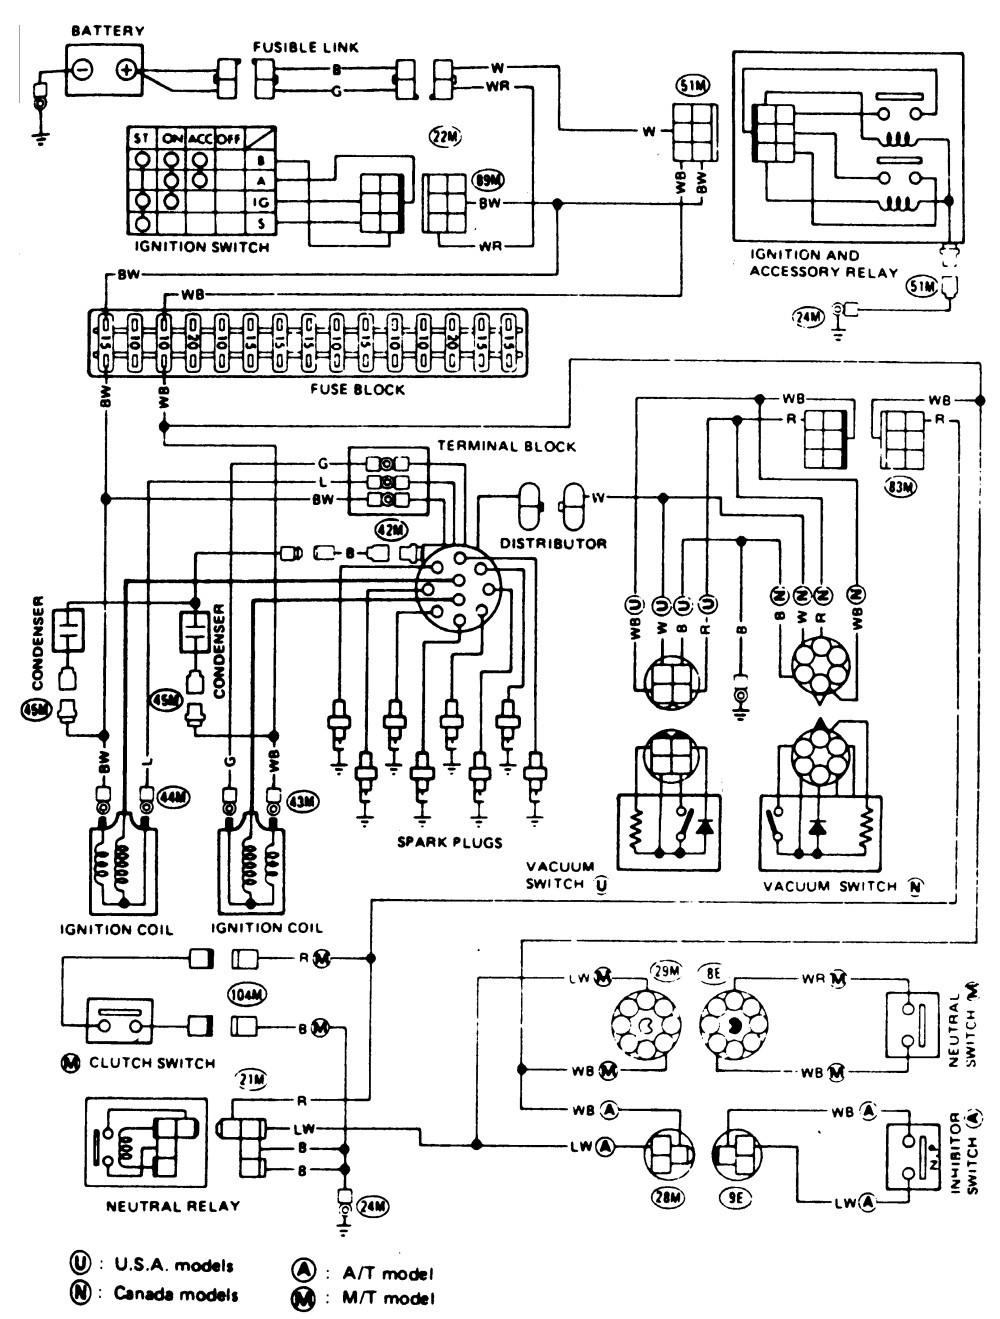 inspirational 240sx wiring diagram wiring diagram image KA24DE Engine Wiring Diagram KA24DE Engine Wiring Diagram